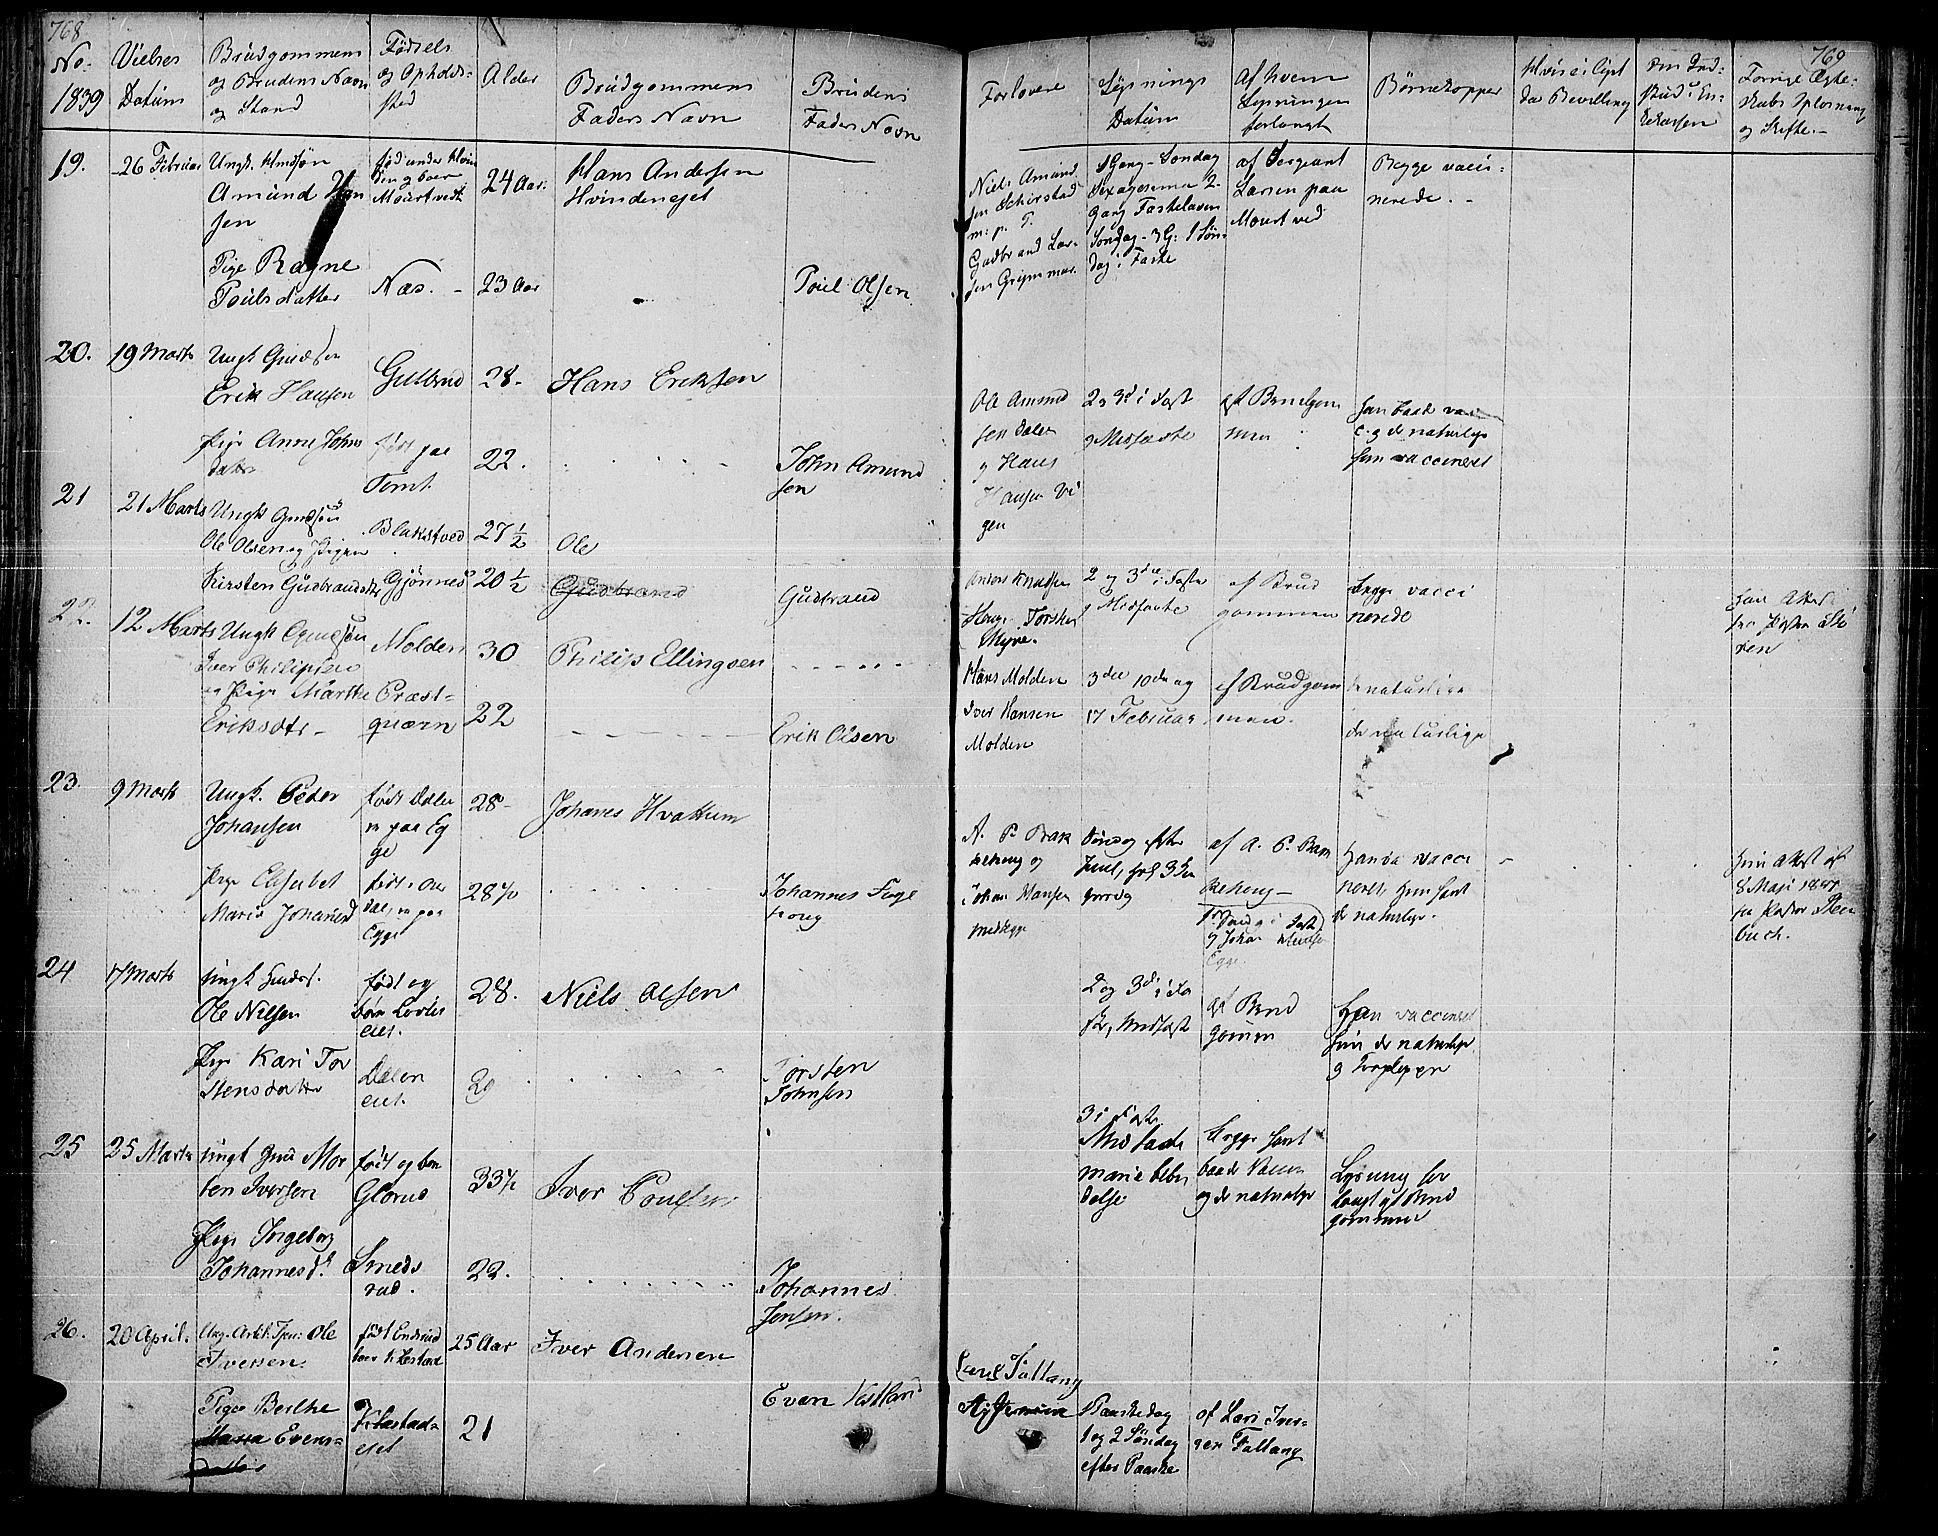 SAH, Gran prestekontor, Ministerialbok nr. 10, 1824-1842, s. 768-769